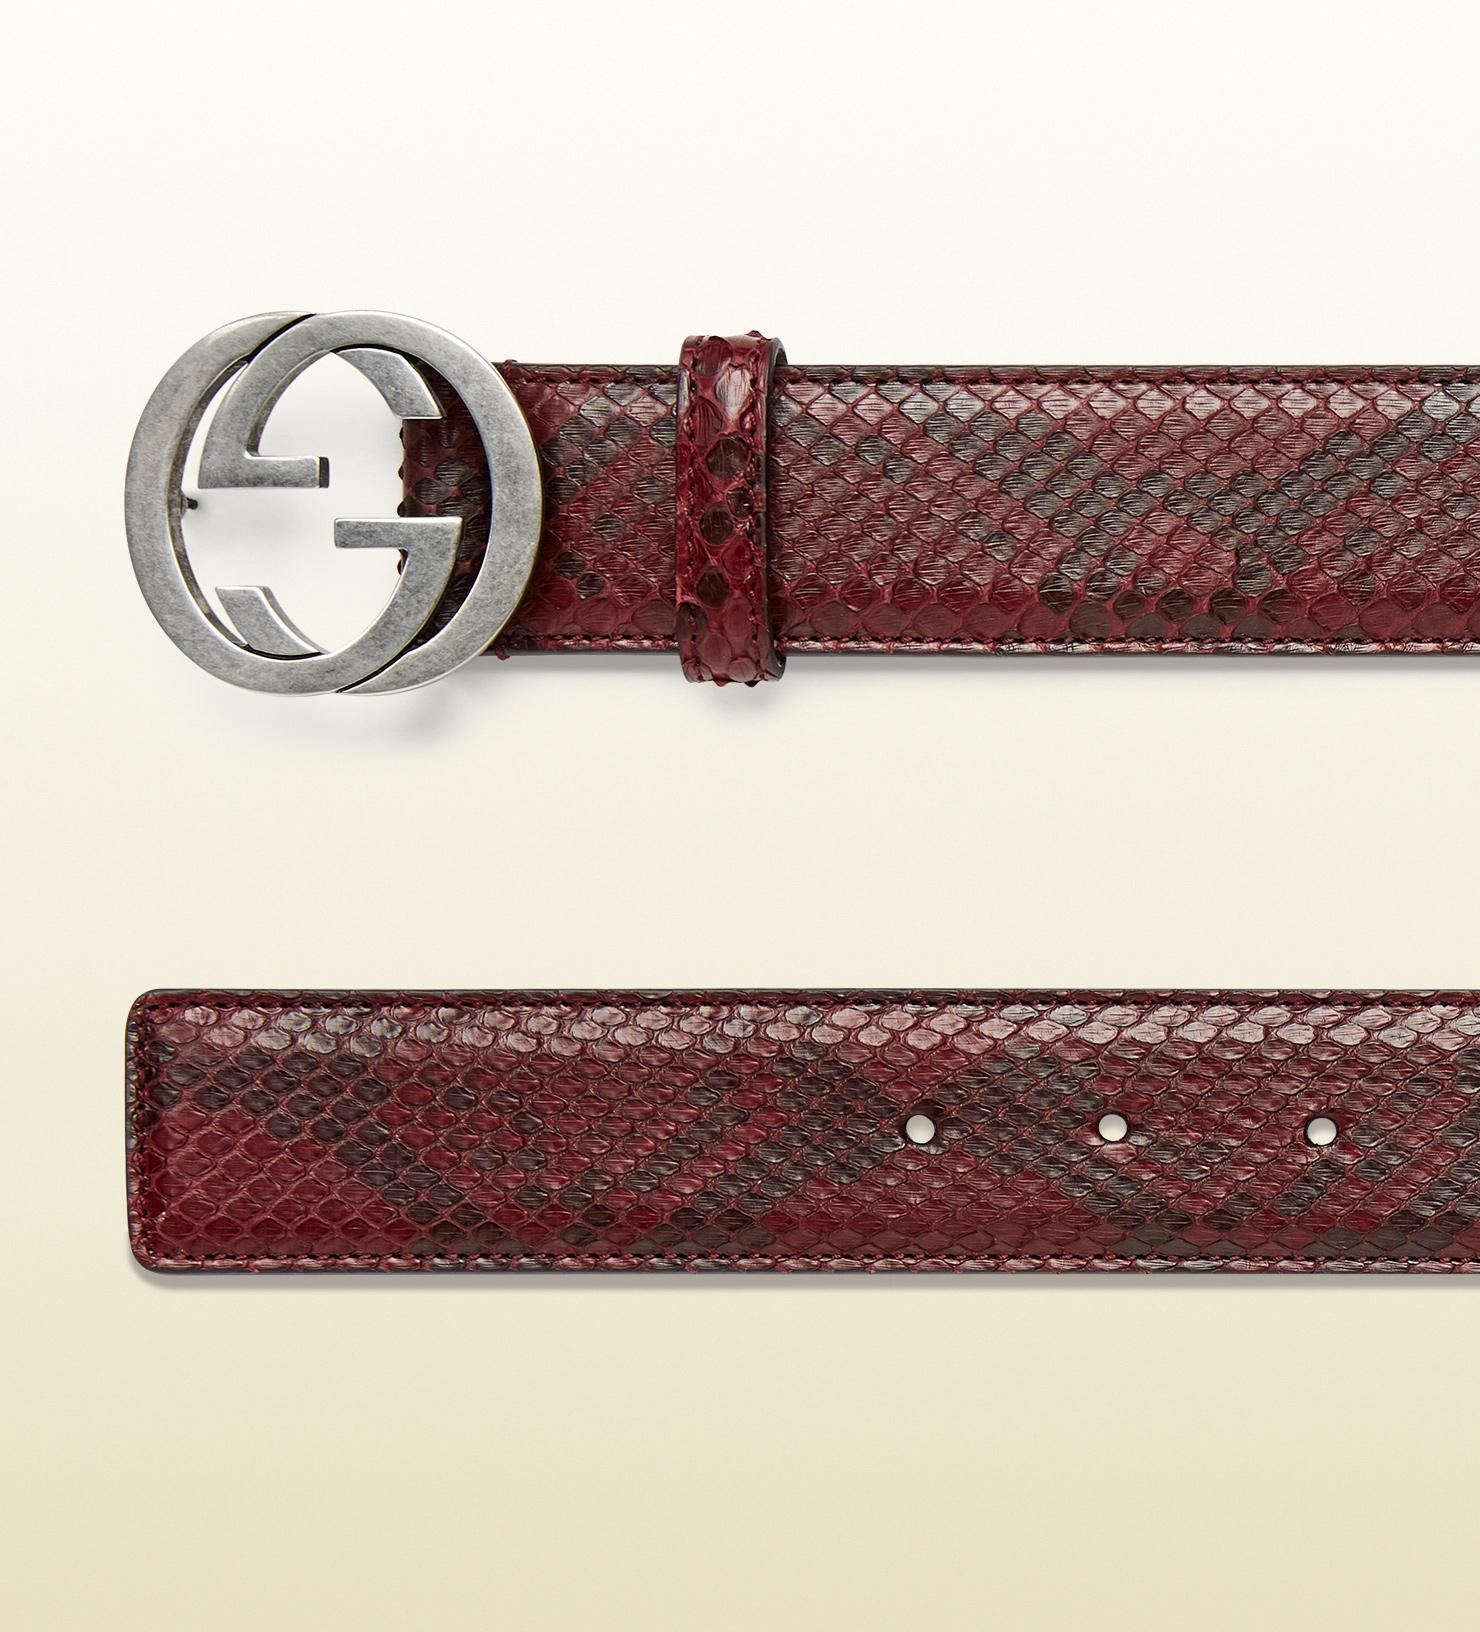 9864edbc761a Gucci Python Belt With Interlocking G Buckle in Red - Lyst